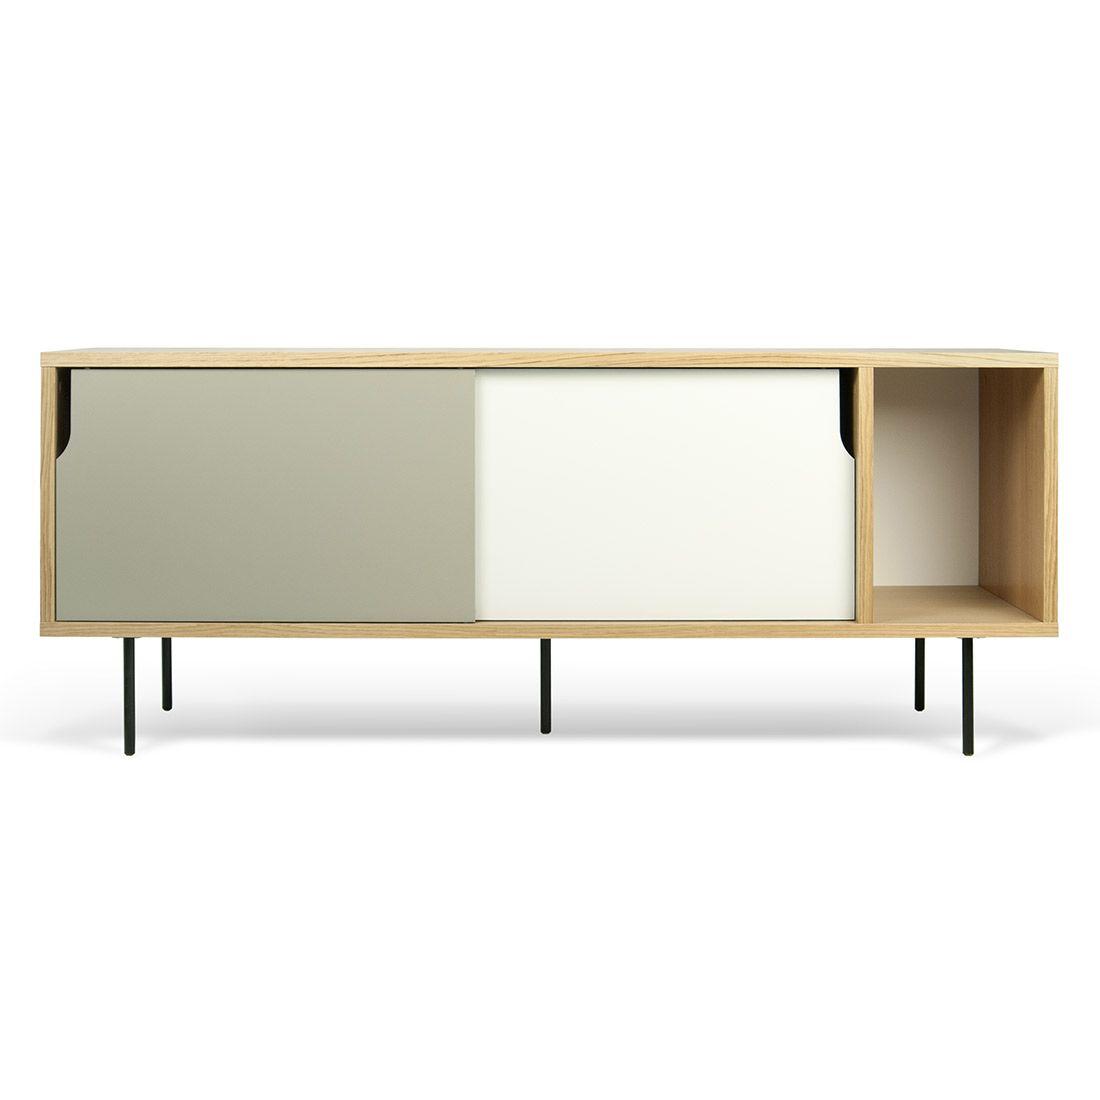 Buffet dann ante bianche e grigie h s h oak sideboard for Mobili design italiani